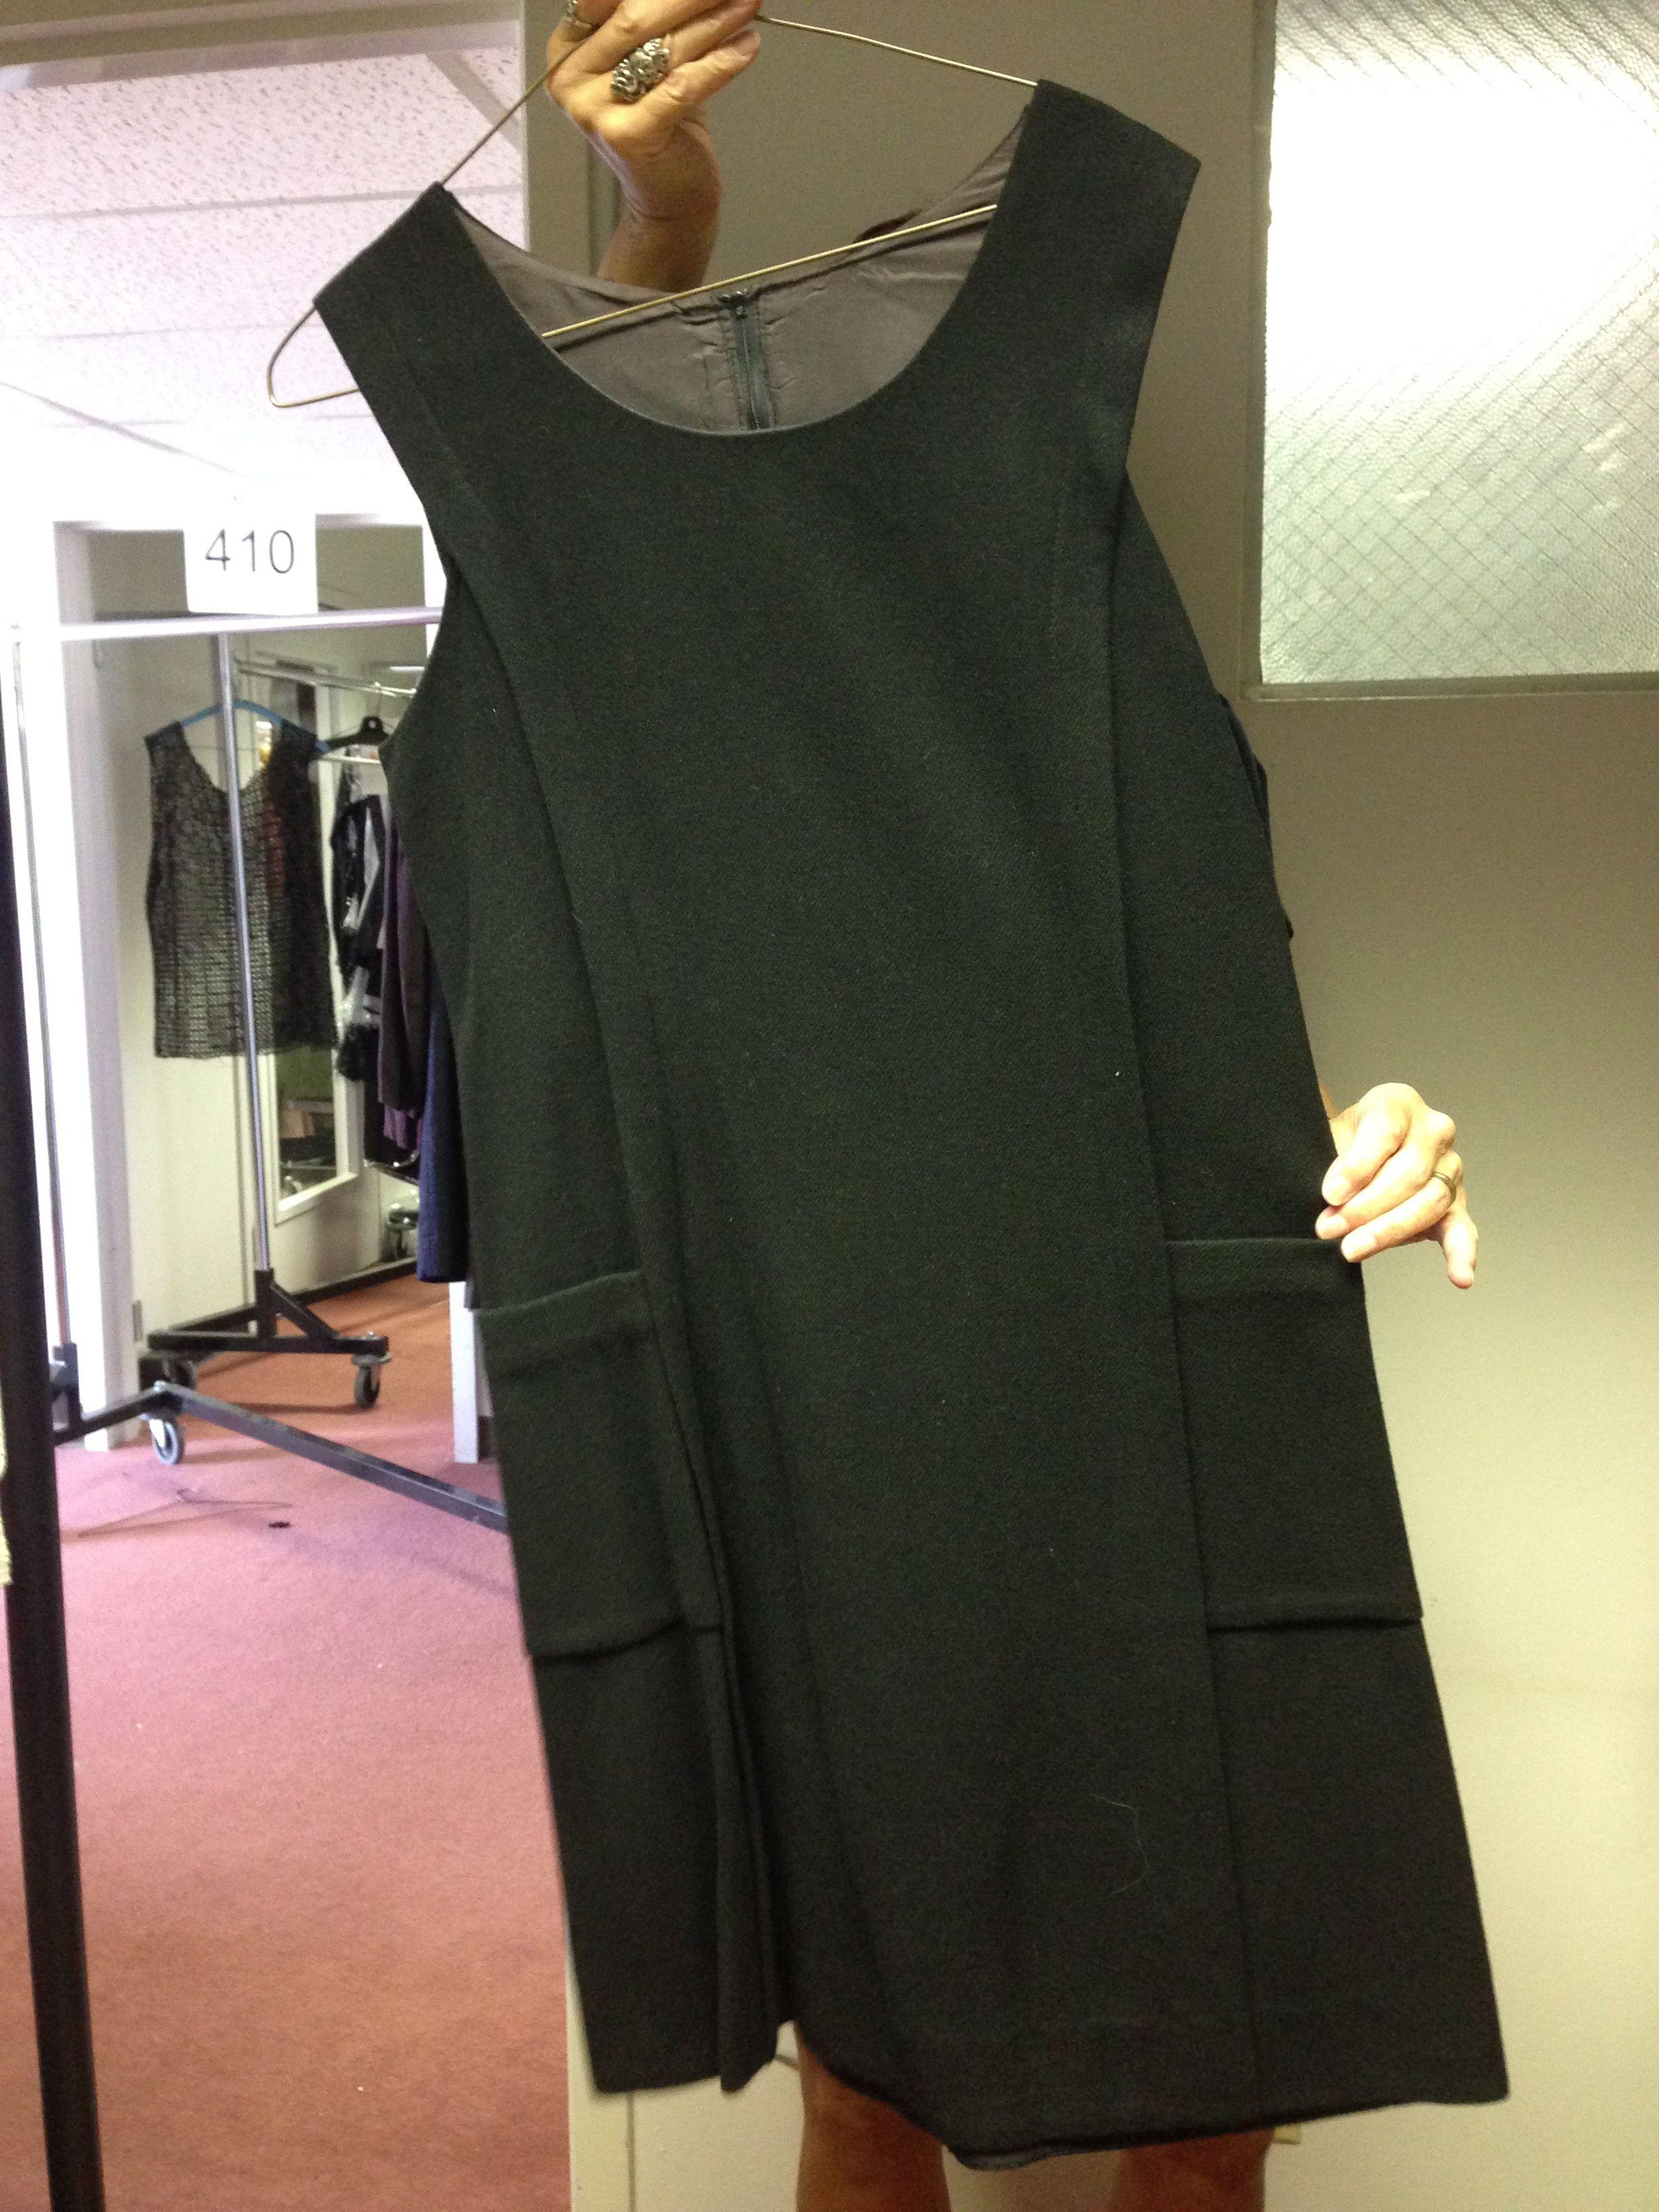 Rachel Black Dress With Pockets Dress Pocket Dress Black Dress With Pockets Dresses [ 3264 x 2448 Pixel ]